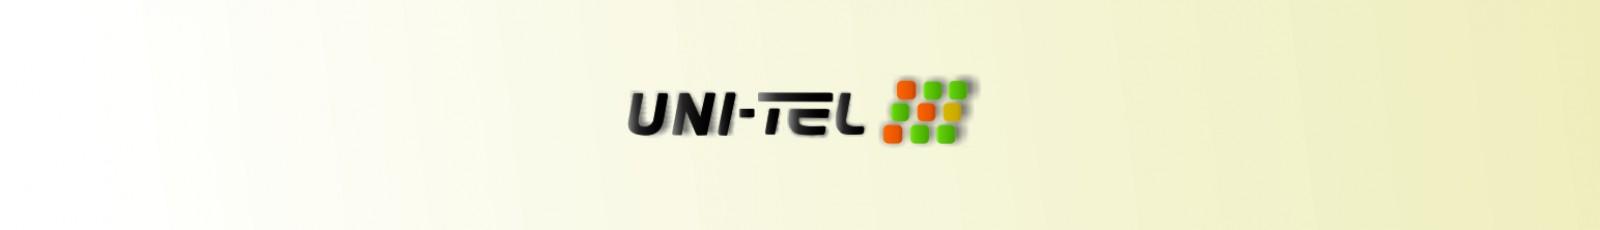 cropped-UNI-TEL-Website-Banner.jpg